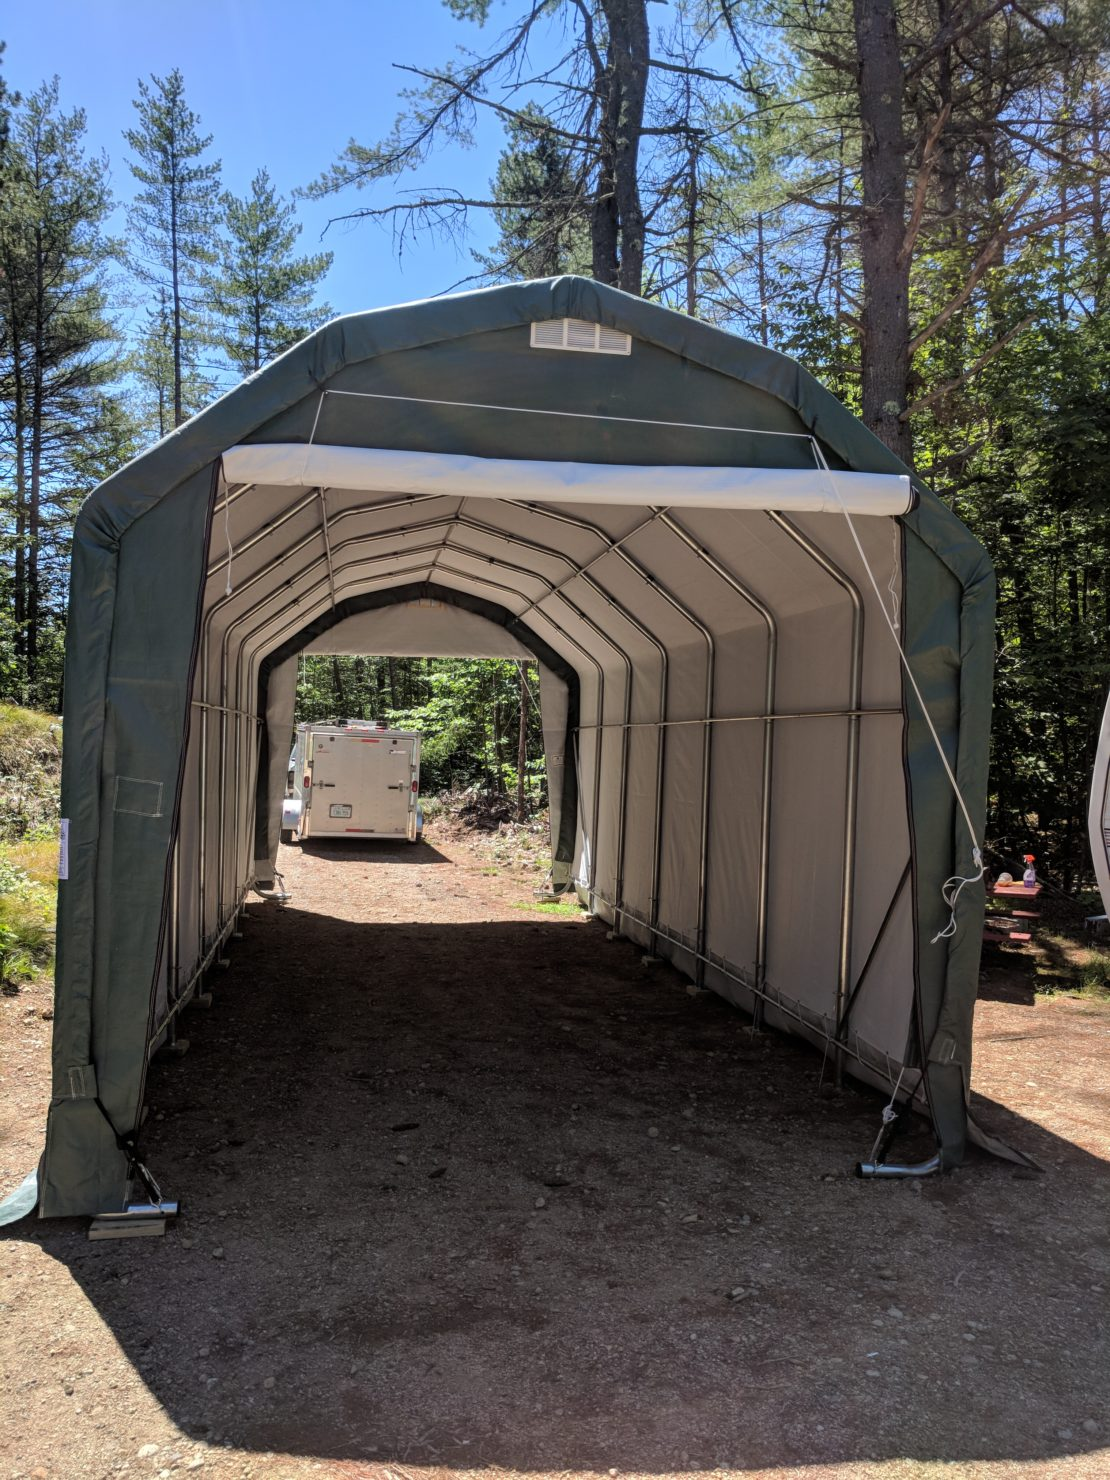 Rhino Shelter 12x28x12 Barn Style Setup on 7-20-18 | Paul ...